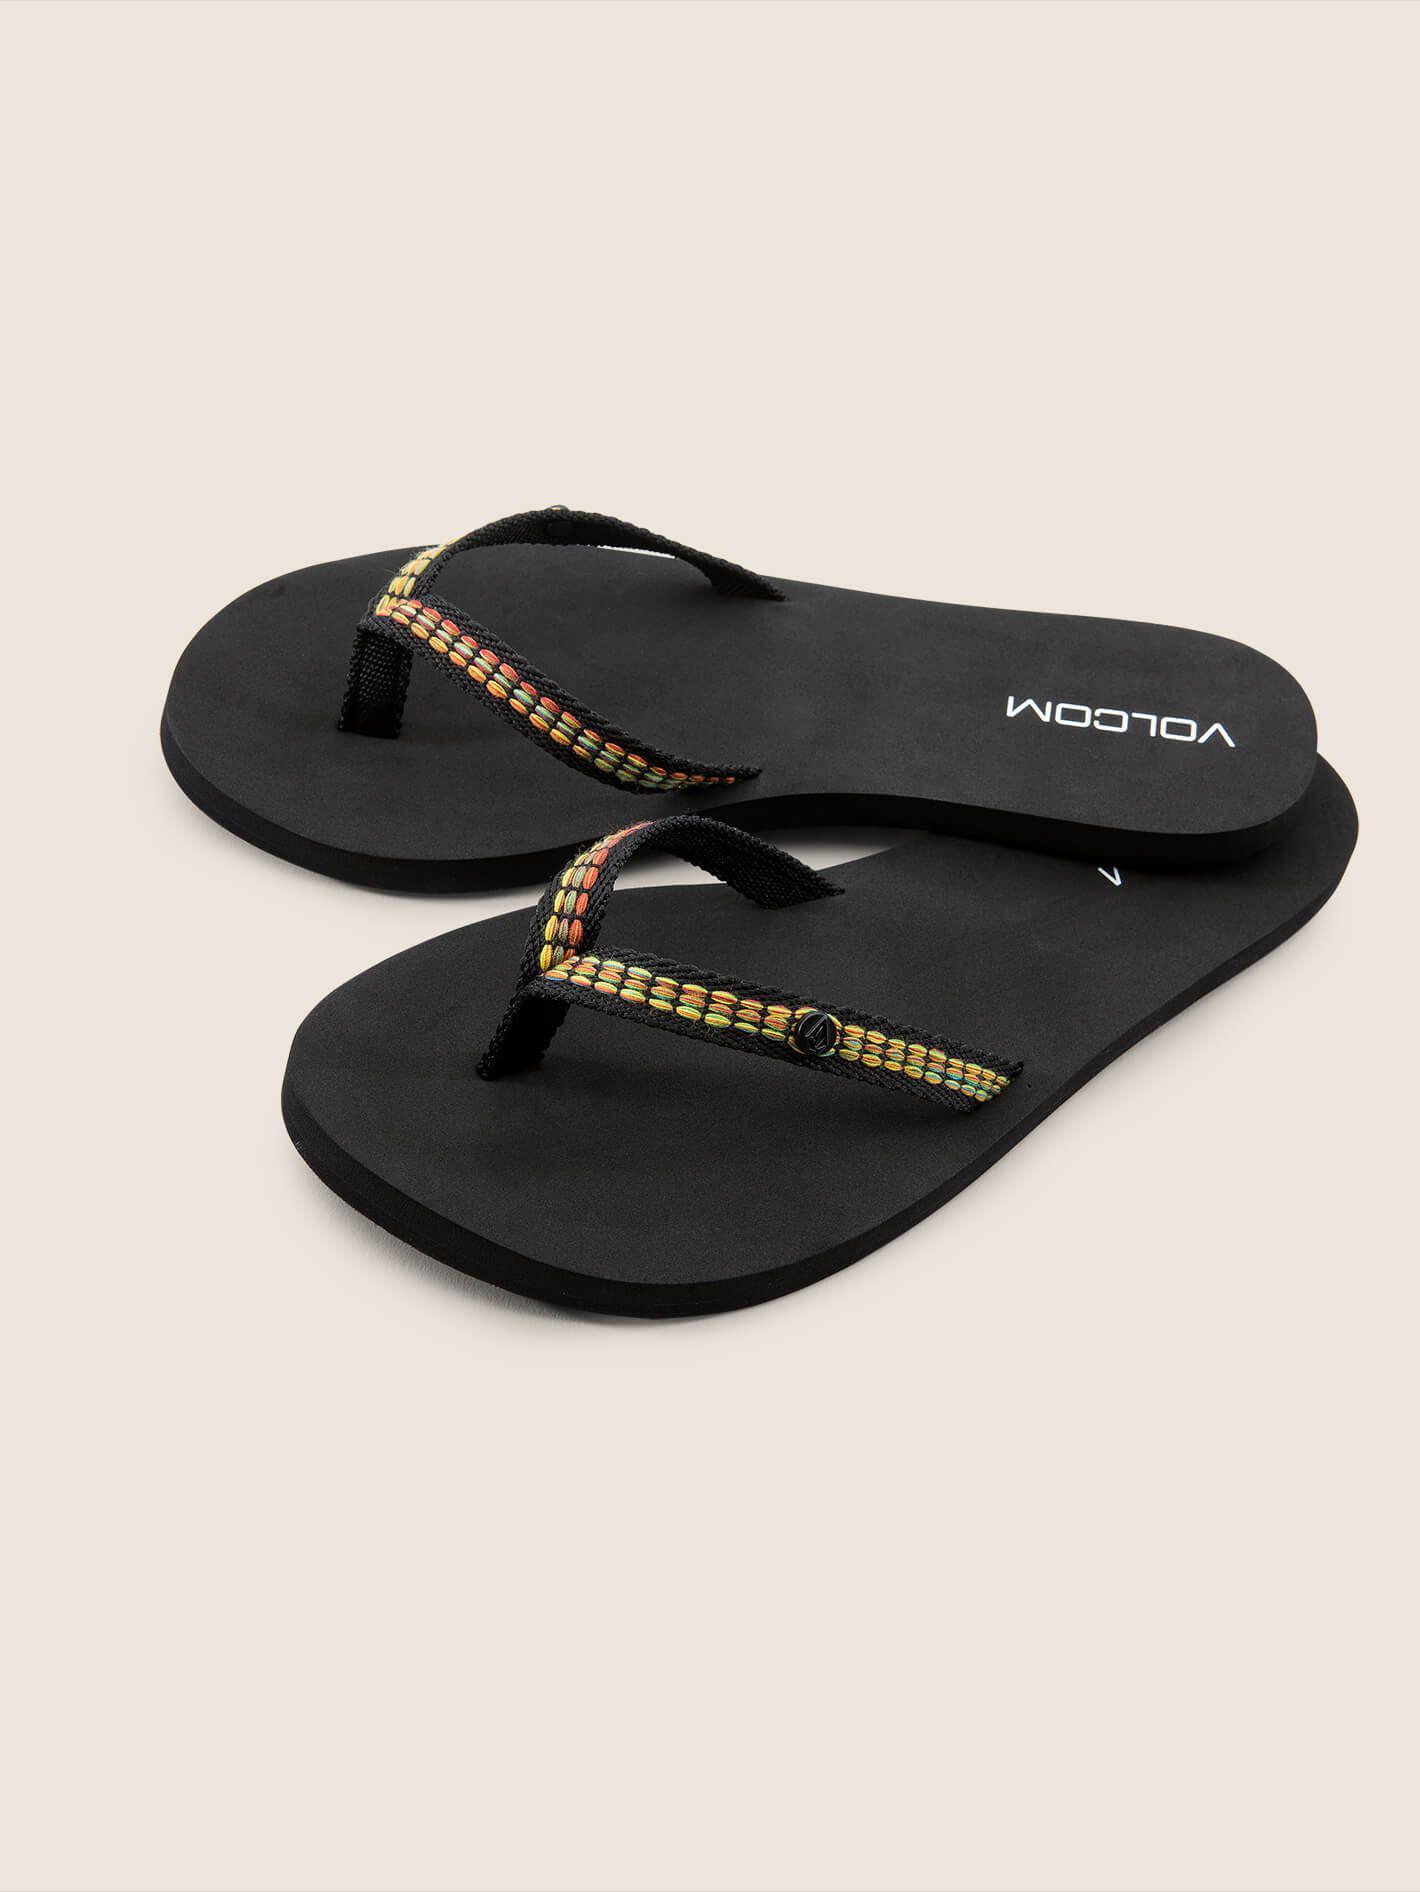 VolcomTrek Sandals GlZoe7a